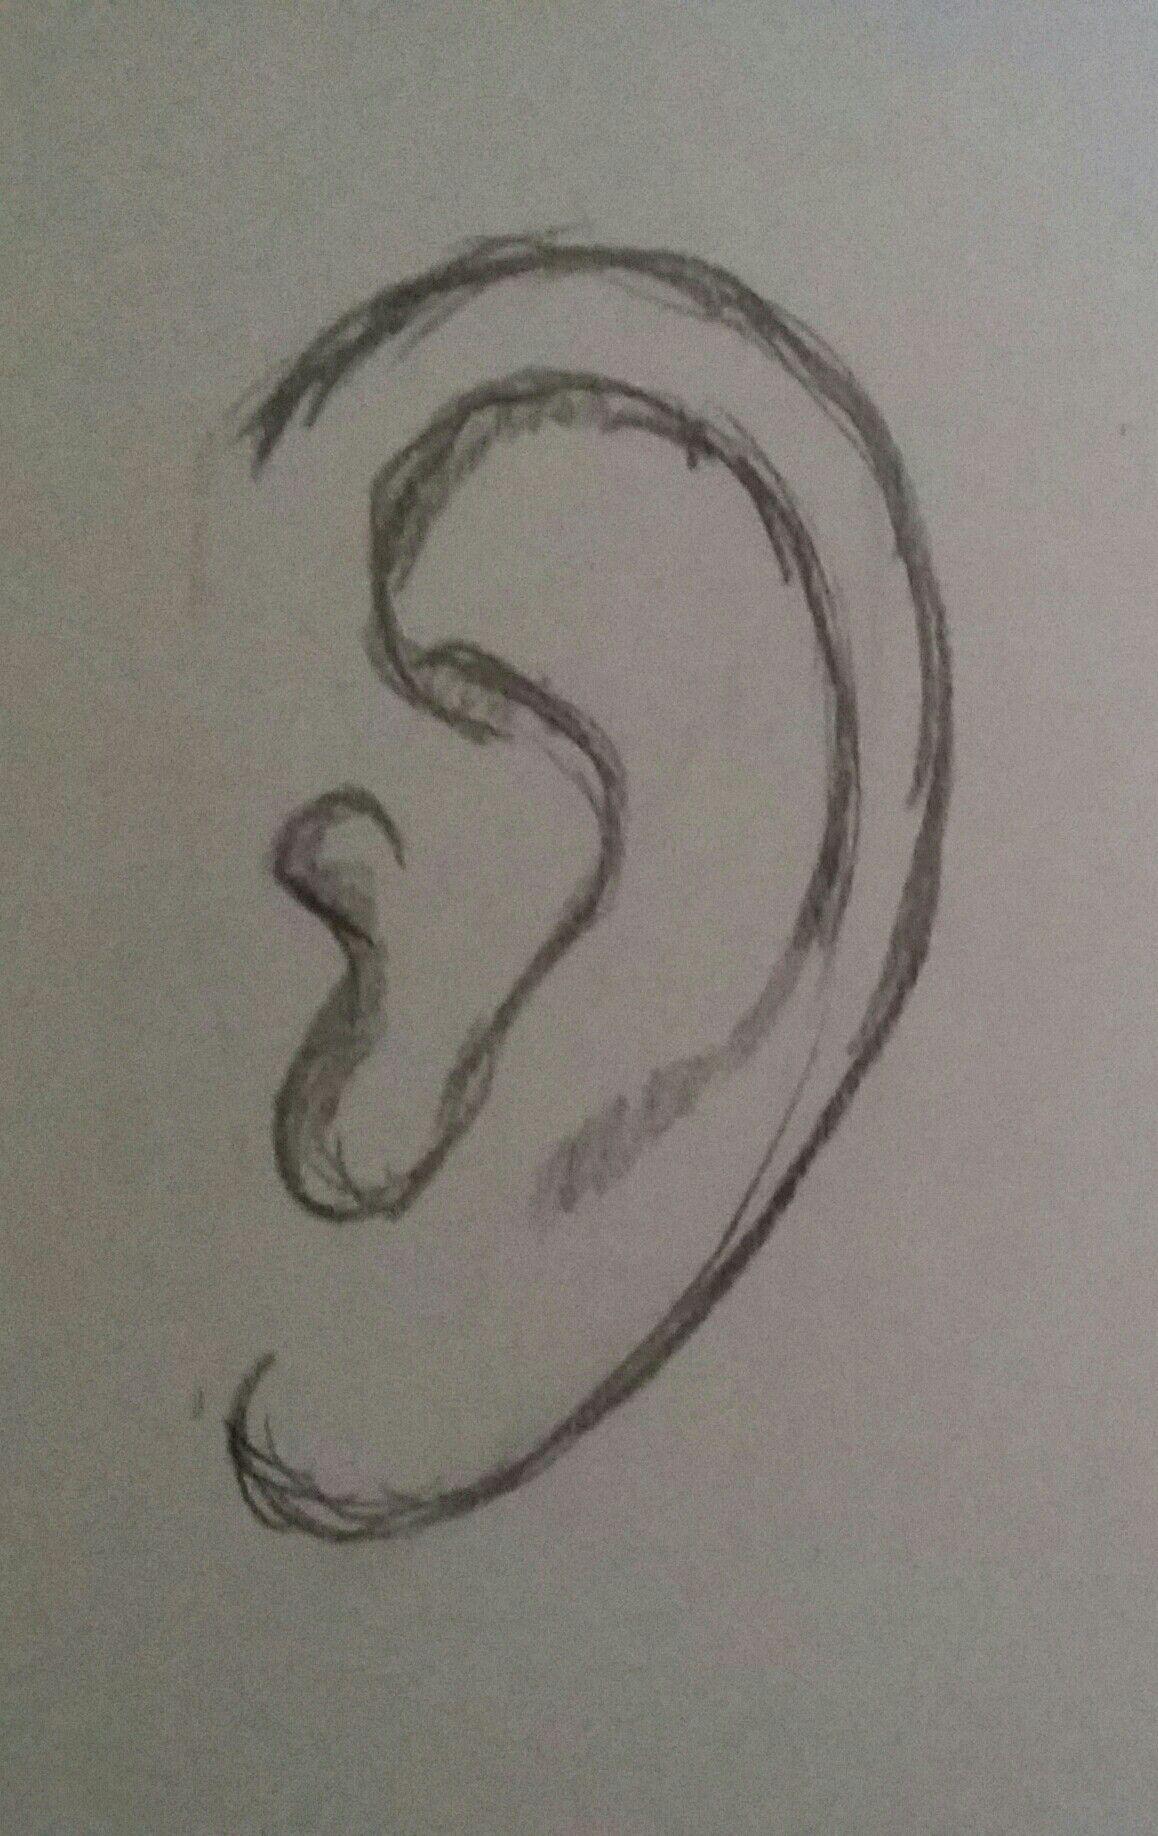 Easy Ear Pencil Drawing In 2020 Pencil Drawings Easy Pencil Art Drawings Art Drawings Sketches Simple